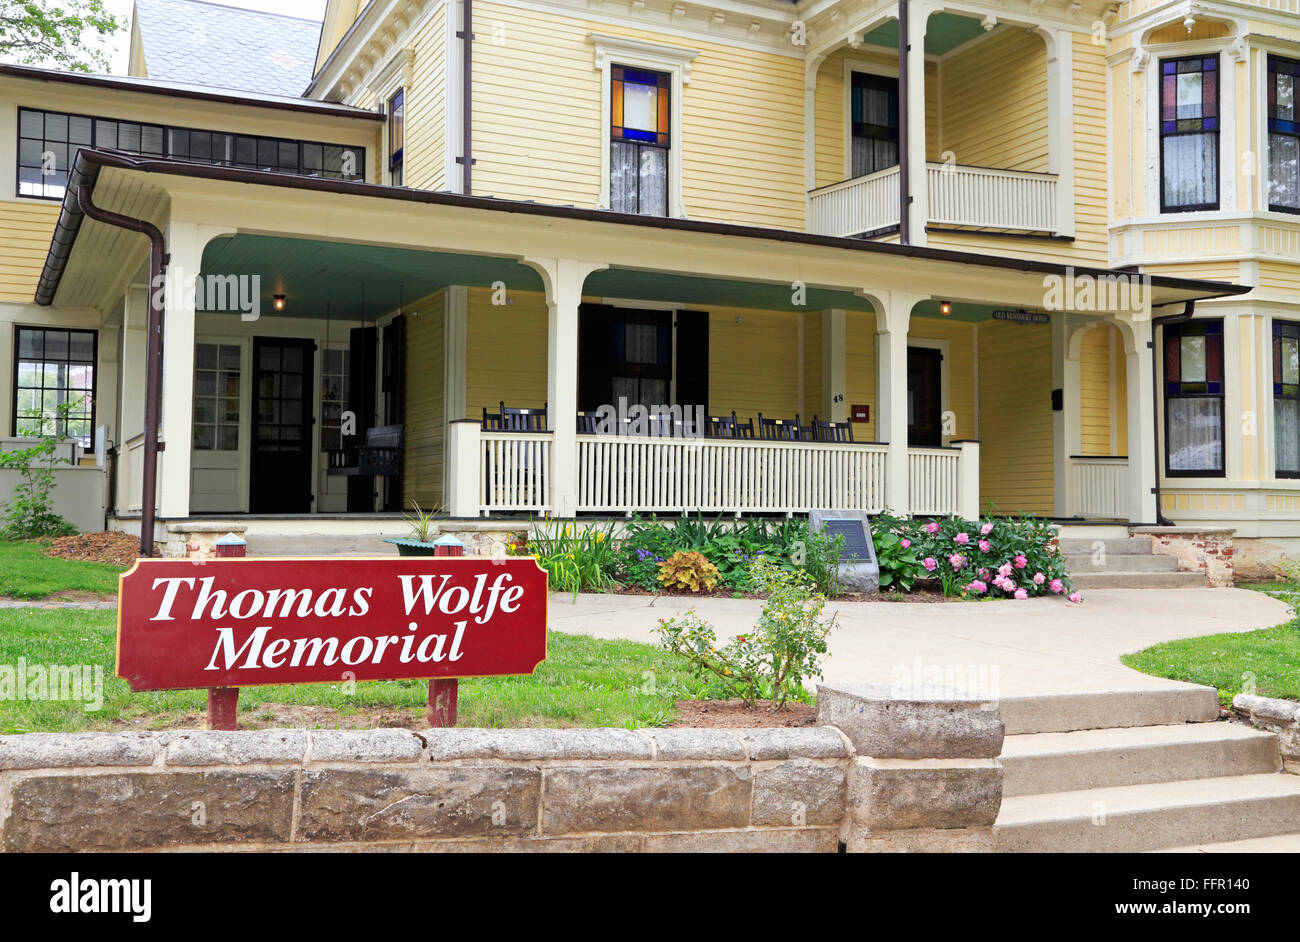 Thomas Wolfe Memorial in Asheville, North Carolina. - Stock Image